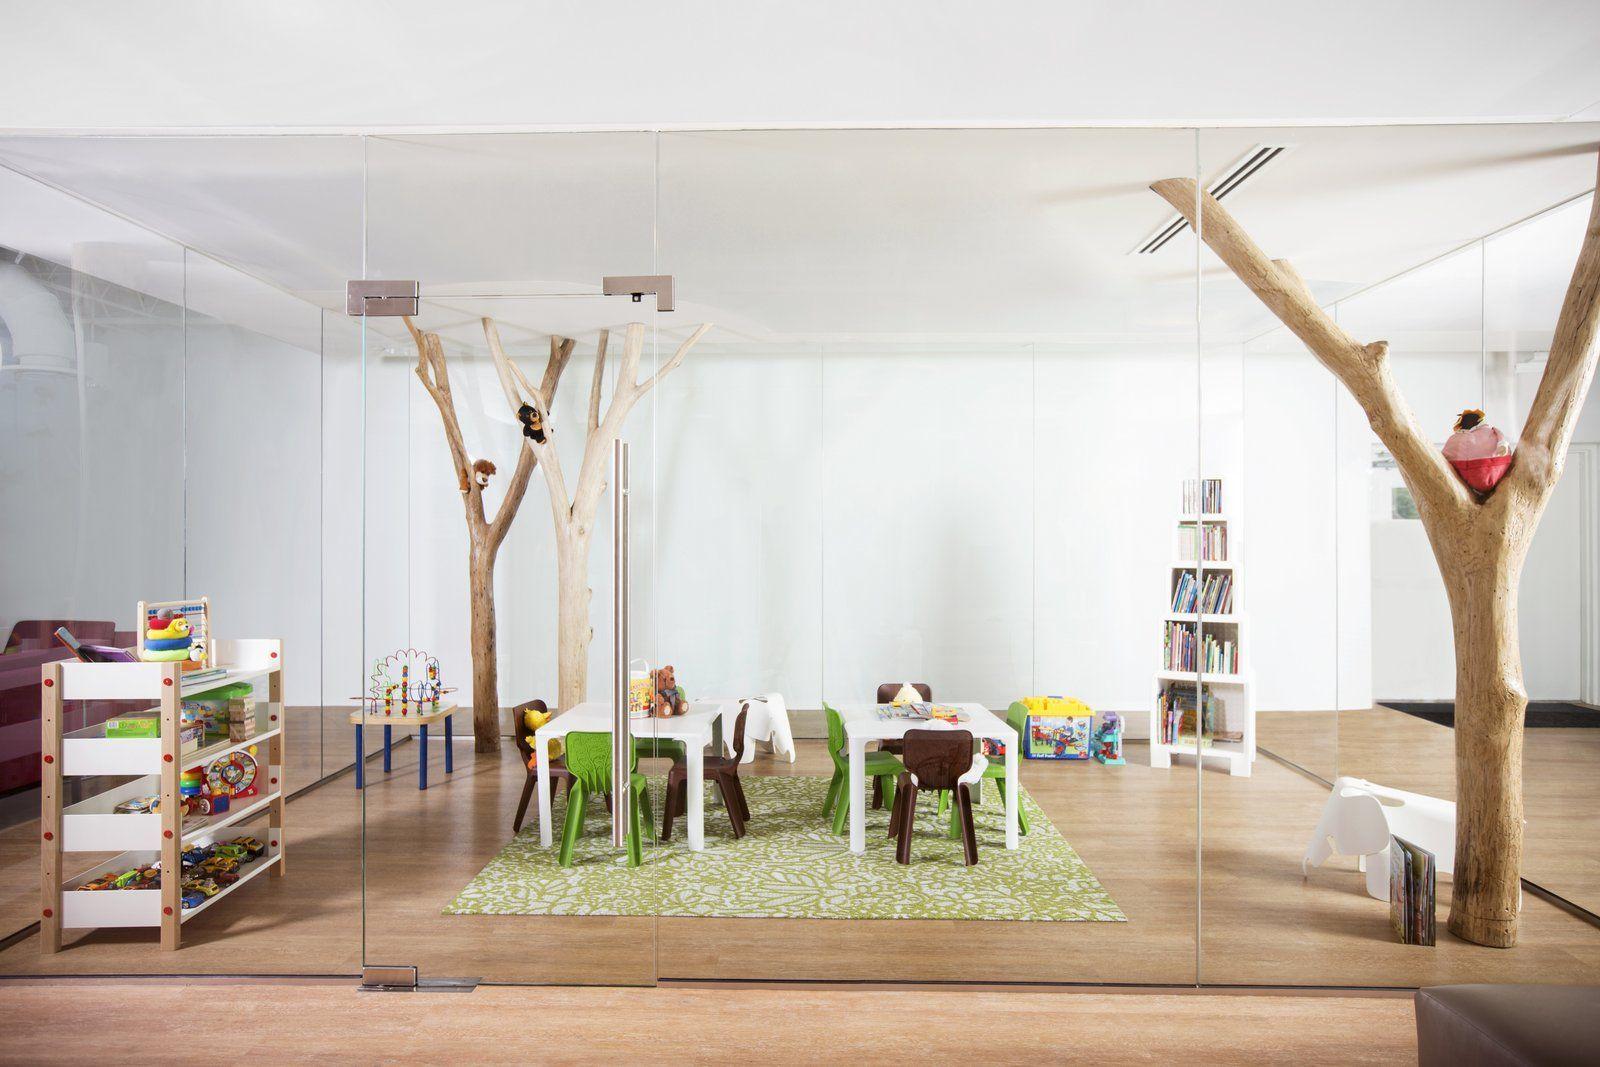 Ywca 388 Office Snapshots Interior Design Games Best Interior Design Websites Interior Design Courses Online